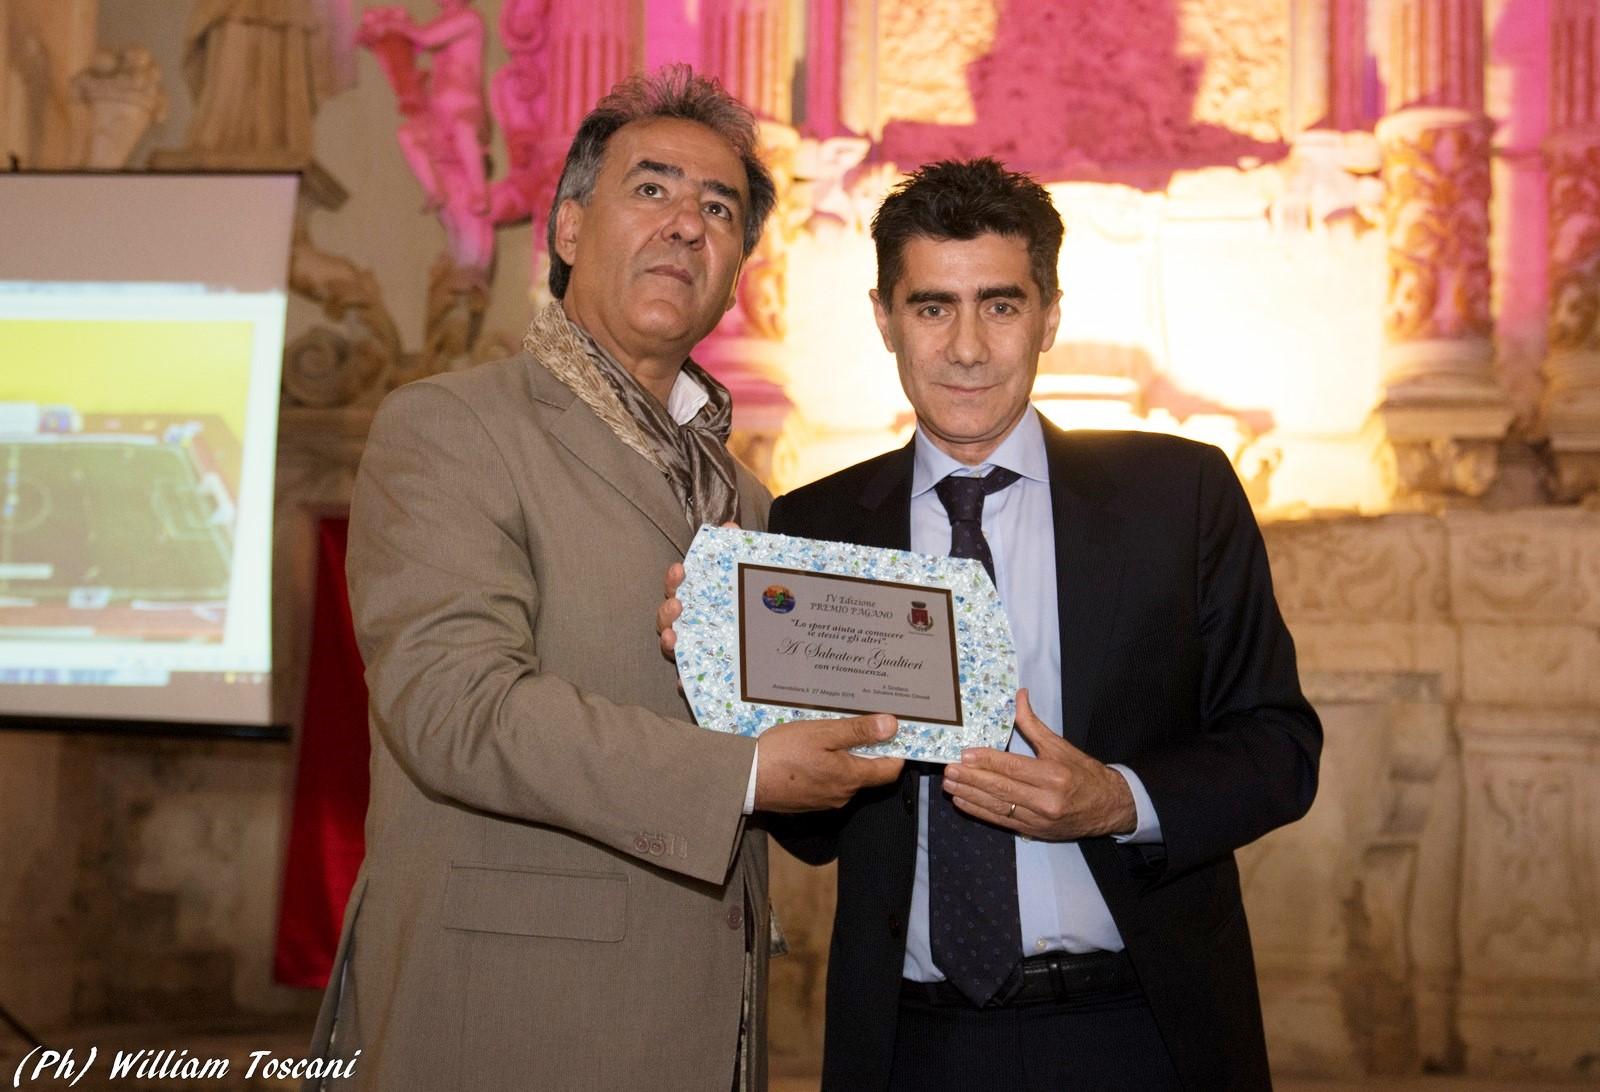 Premio_pagano_016